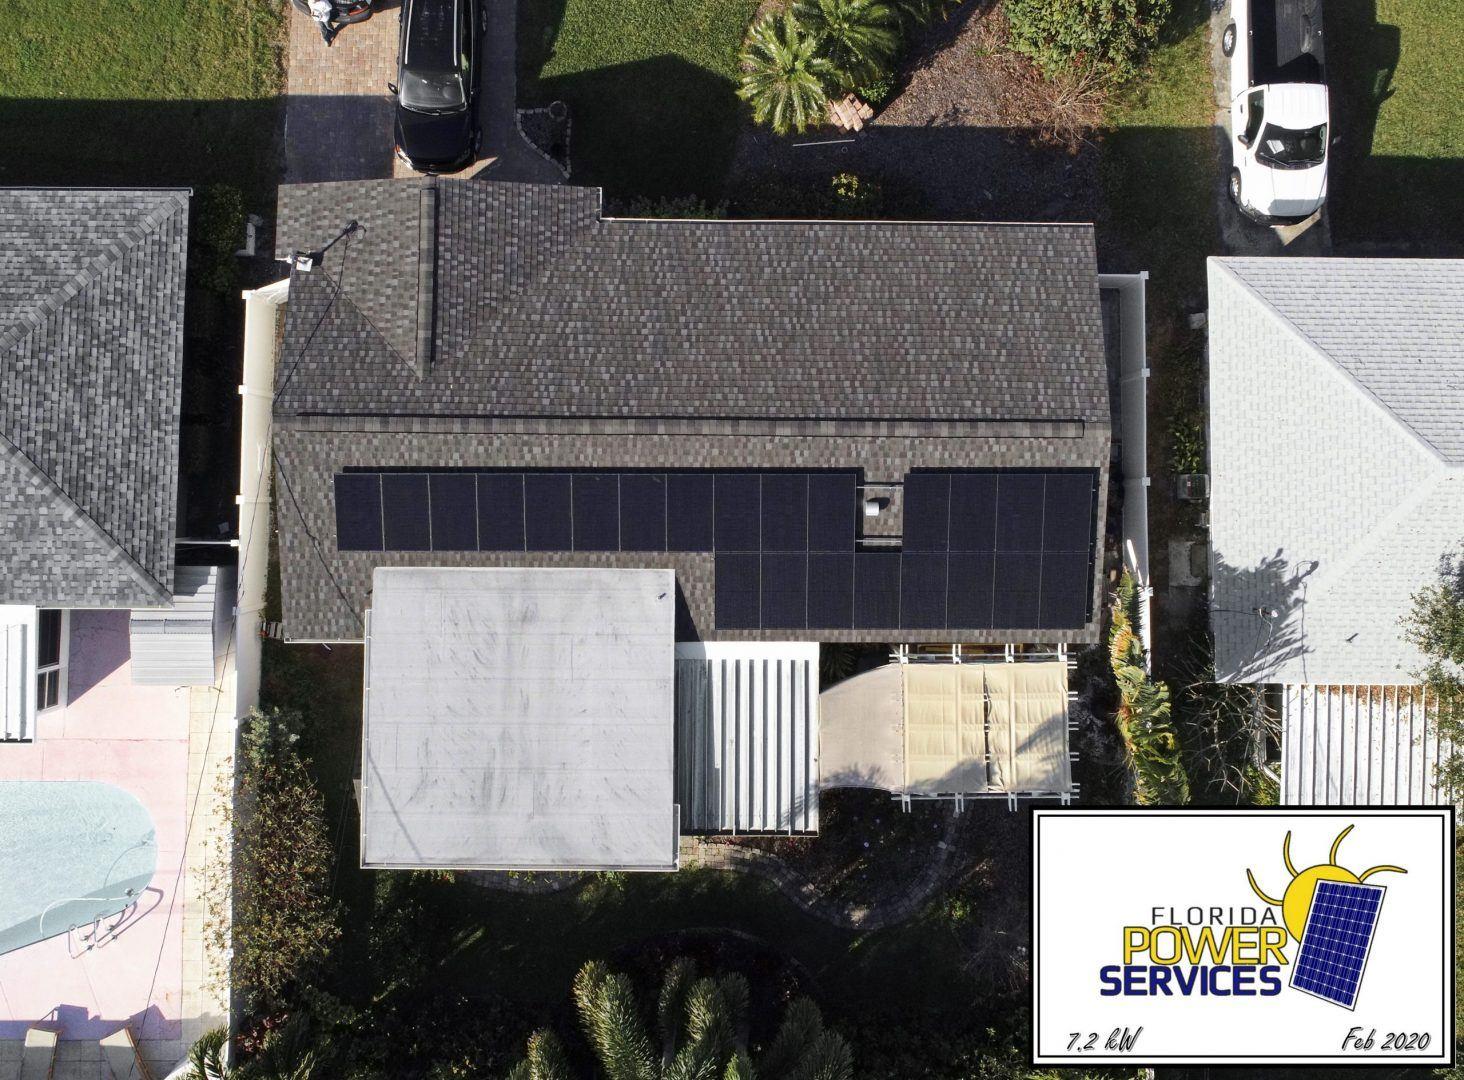 Seminole 7.2 kW Micro Inverter Residential Solar